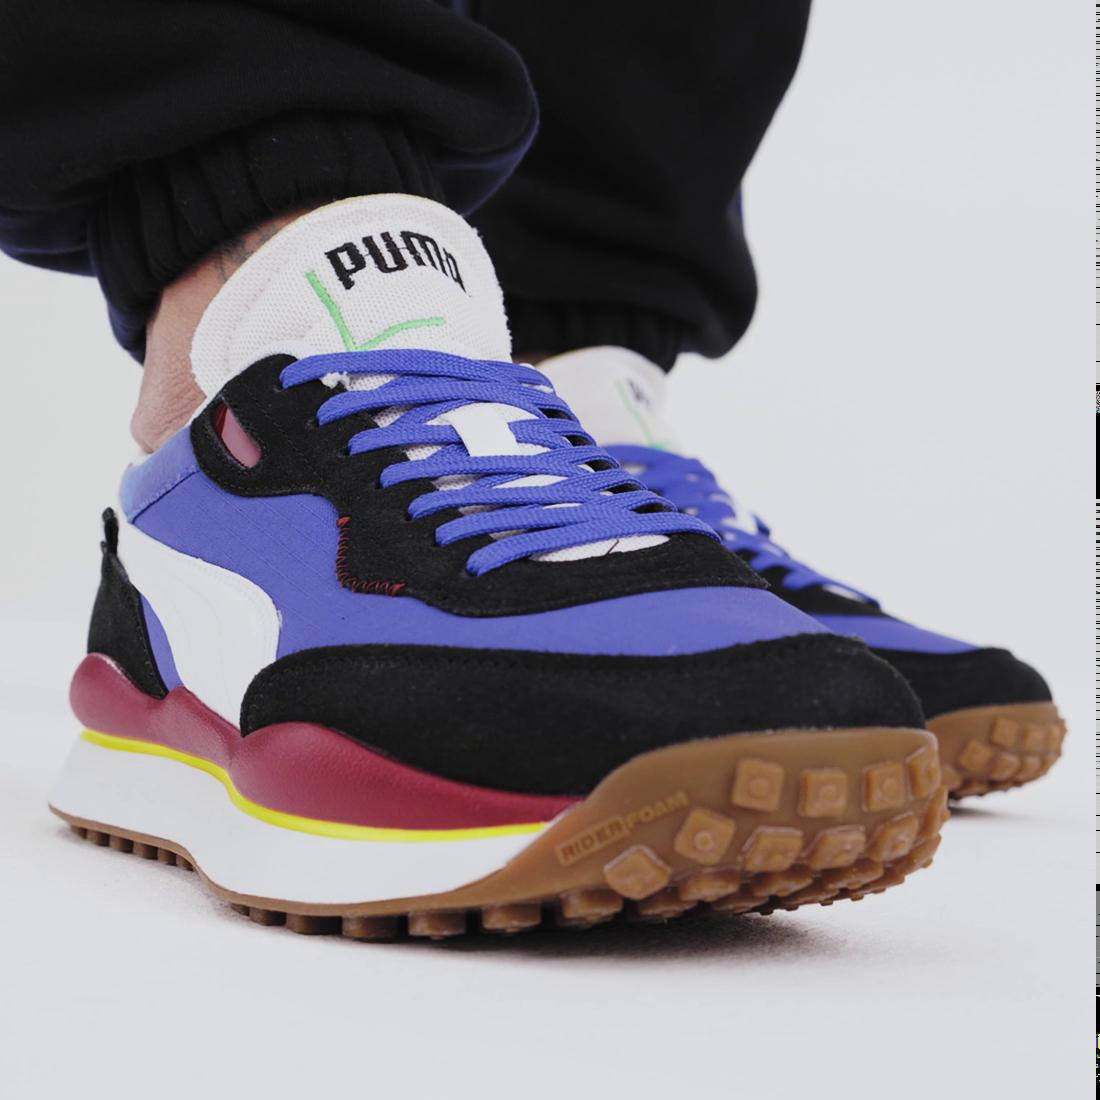 Görüntü Puma STYLE RIDER PLAY ON Ayakkabı #7